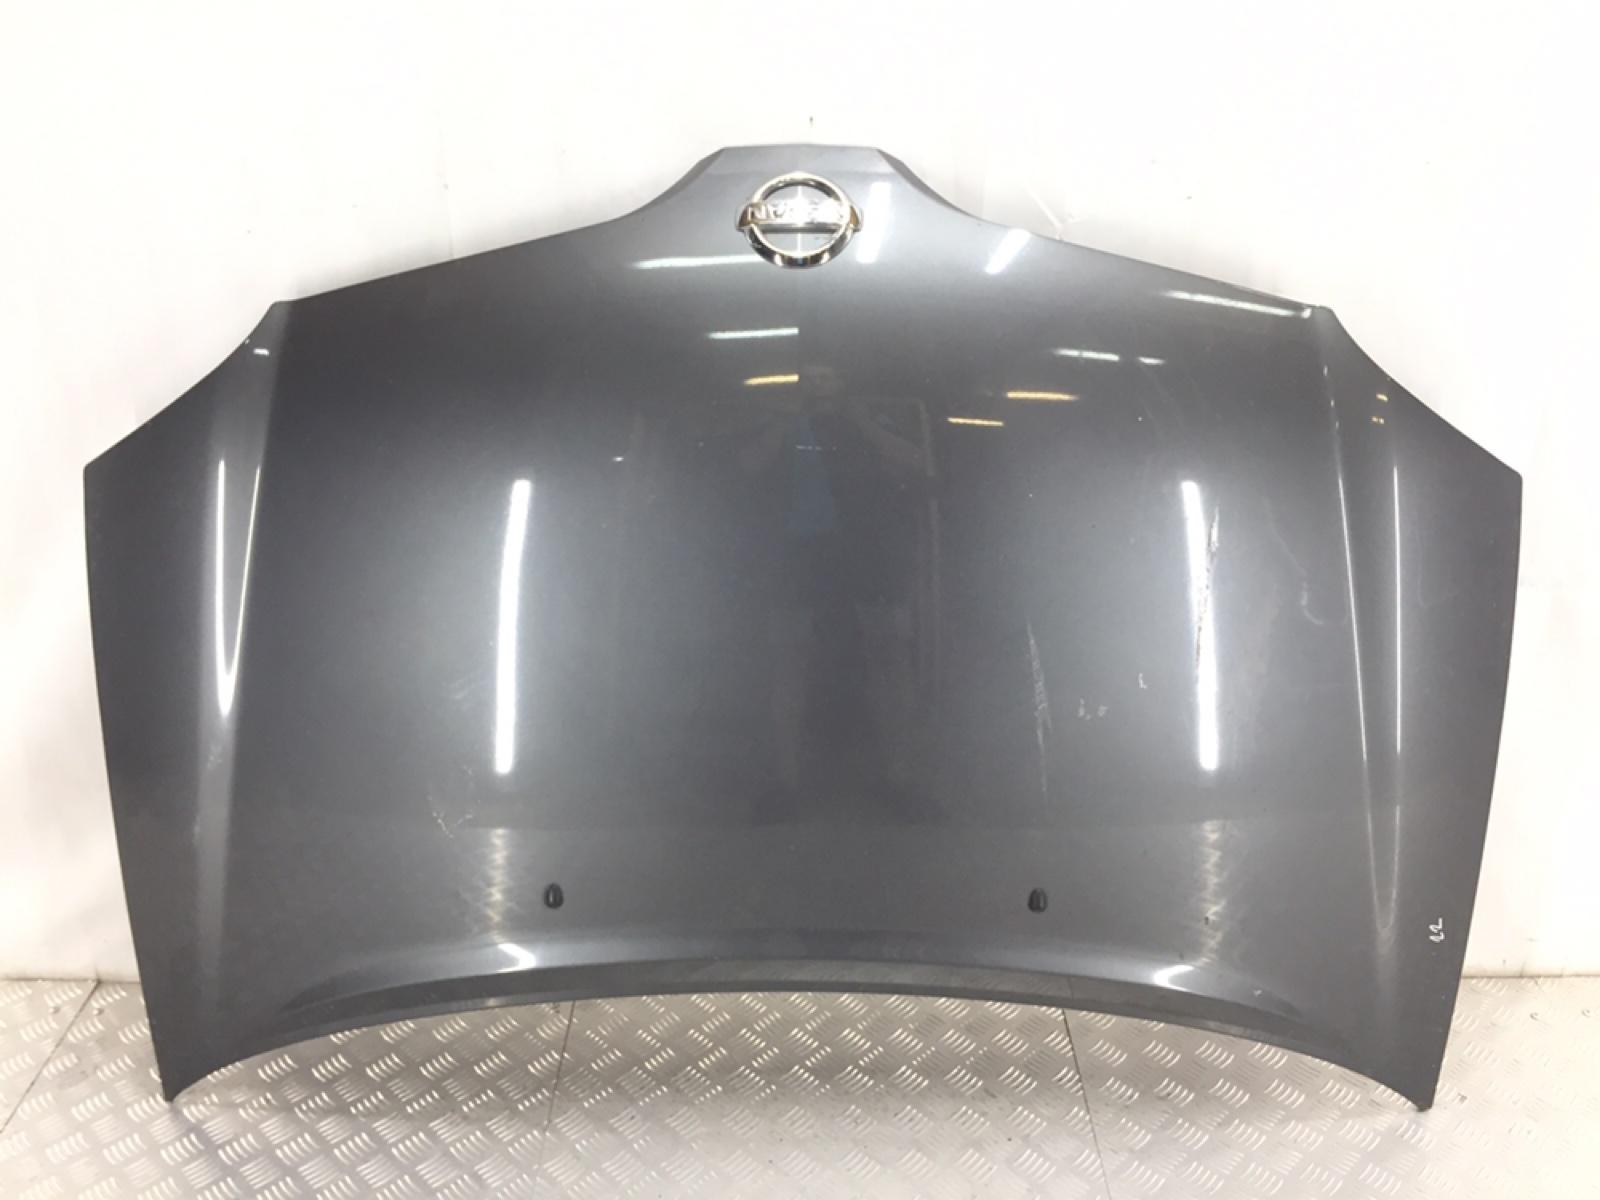 Капот Nissan Almera Tino 1.8 I 2005 (б/у)